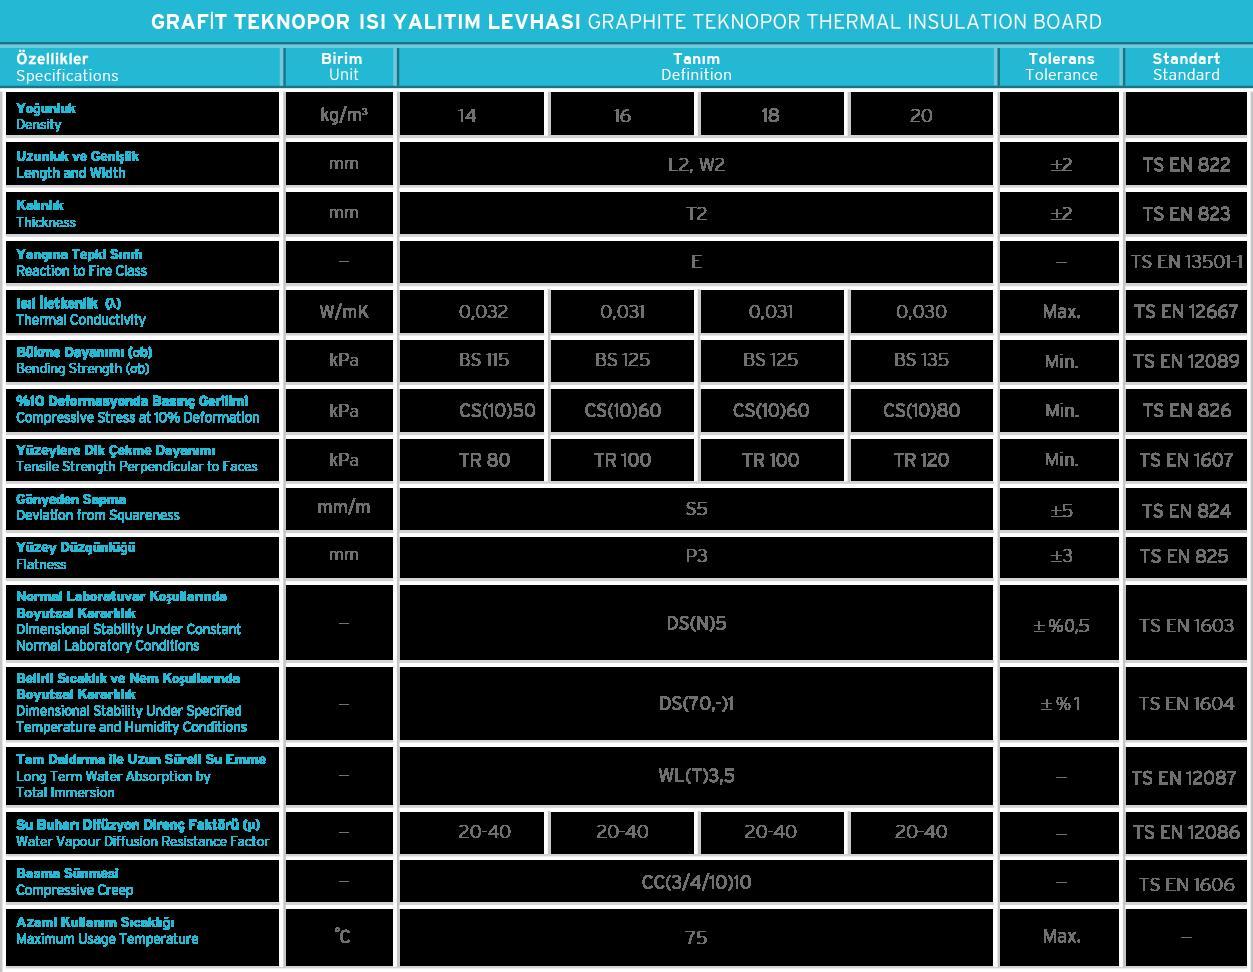 Graphite Teknopor Thermal Insulation Board Technical Specifications